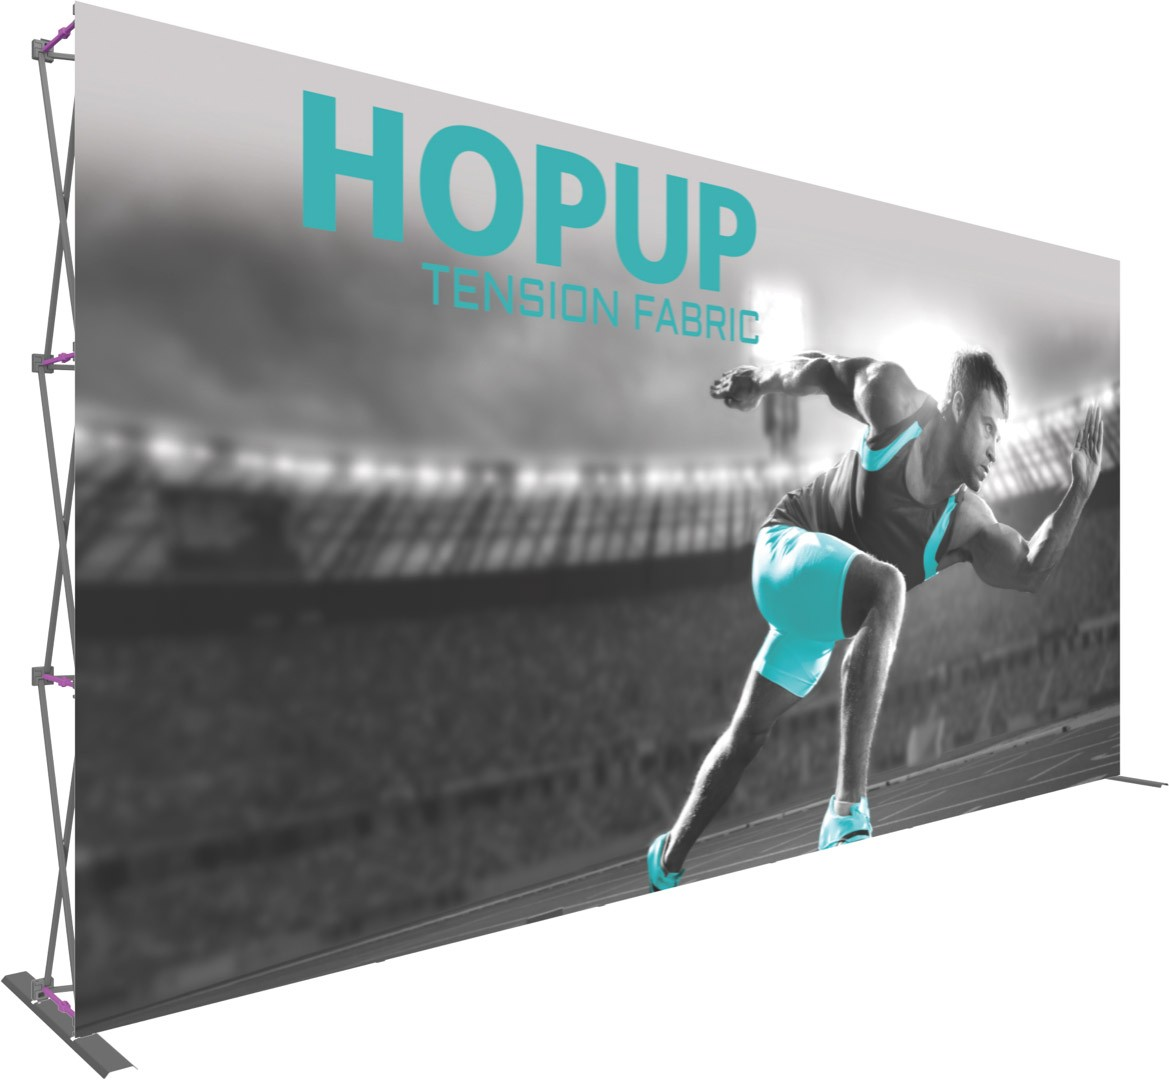 Pop Up Fabric Displays Tension Trade Show Tradeshowdisplaypros